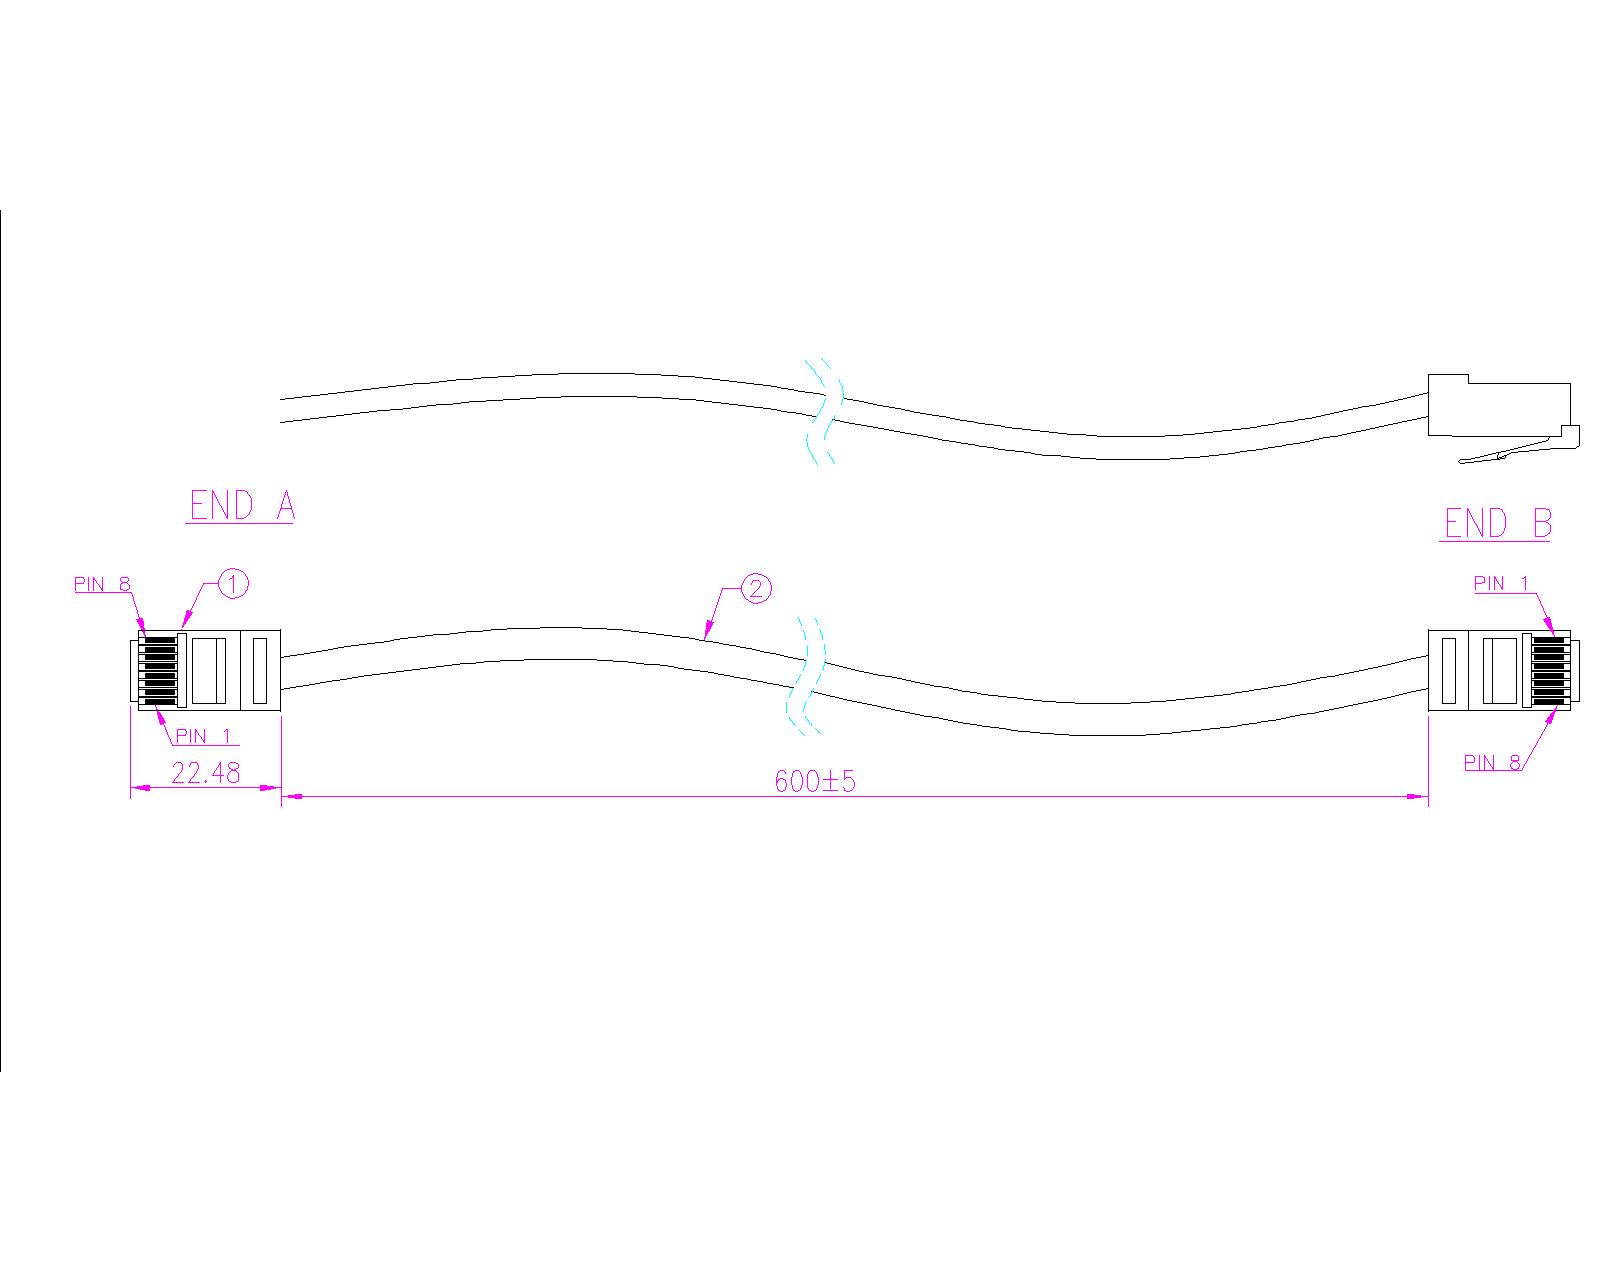 wiring diagram for rj45